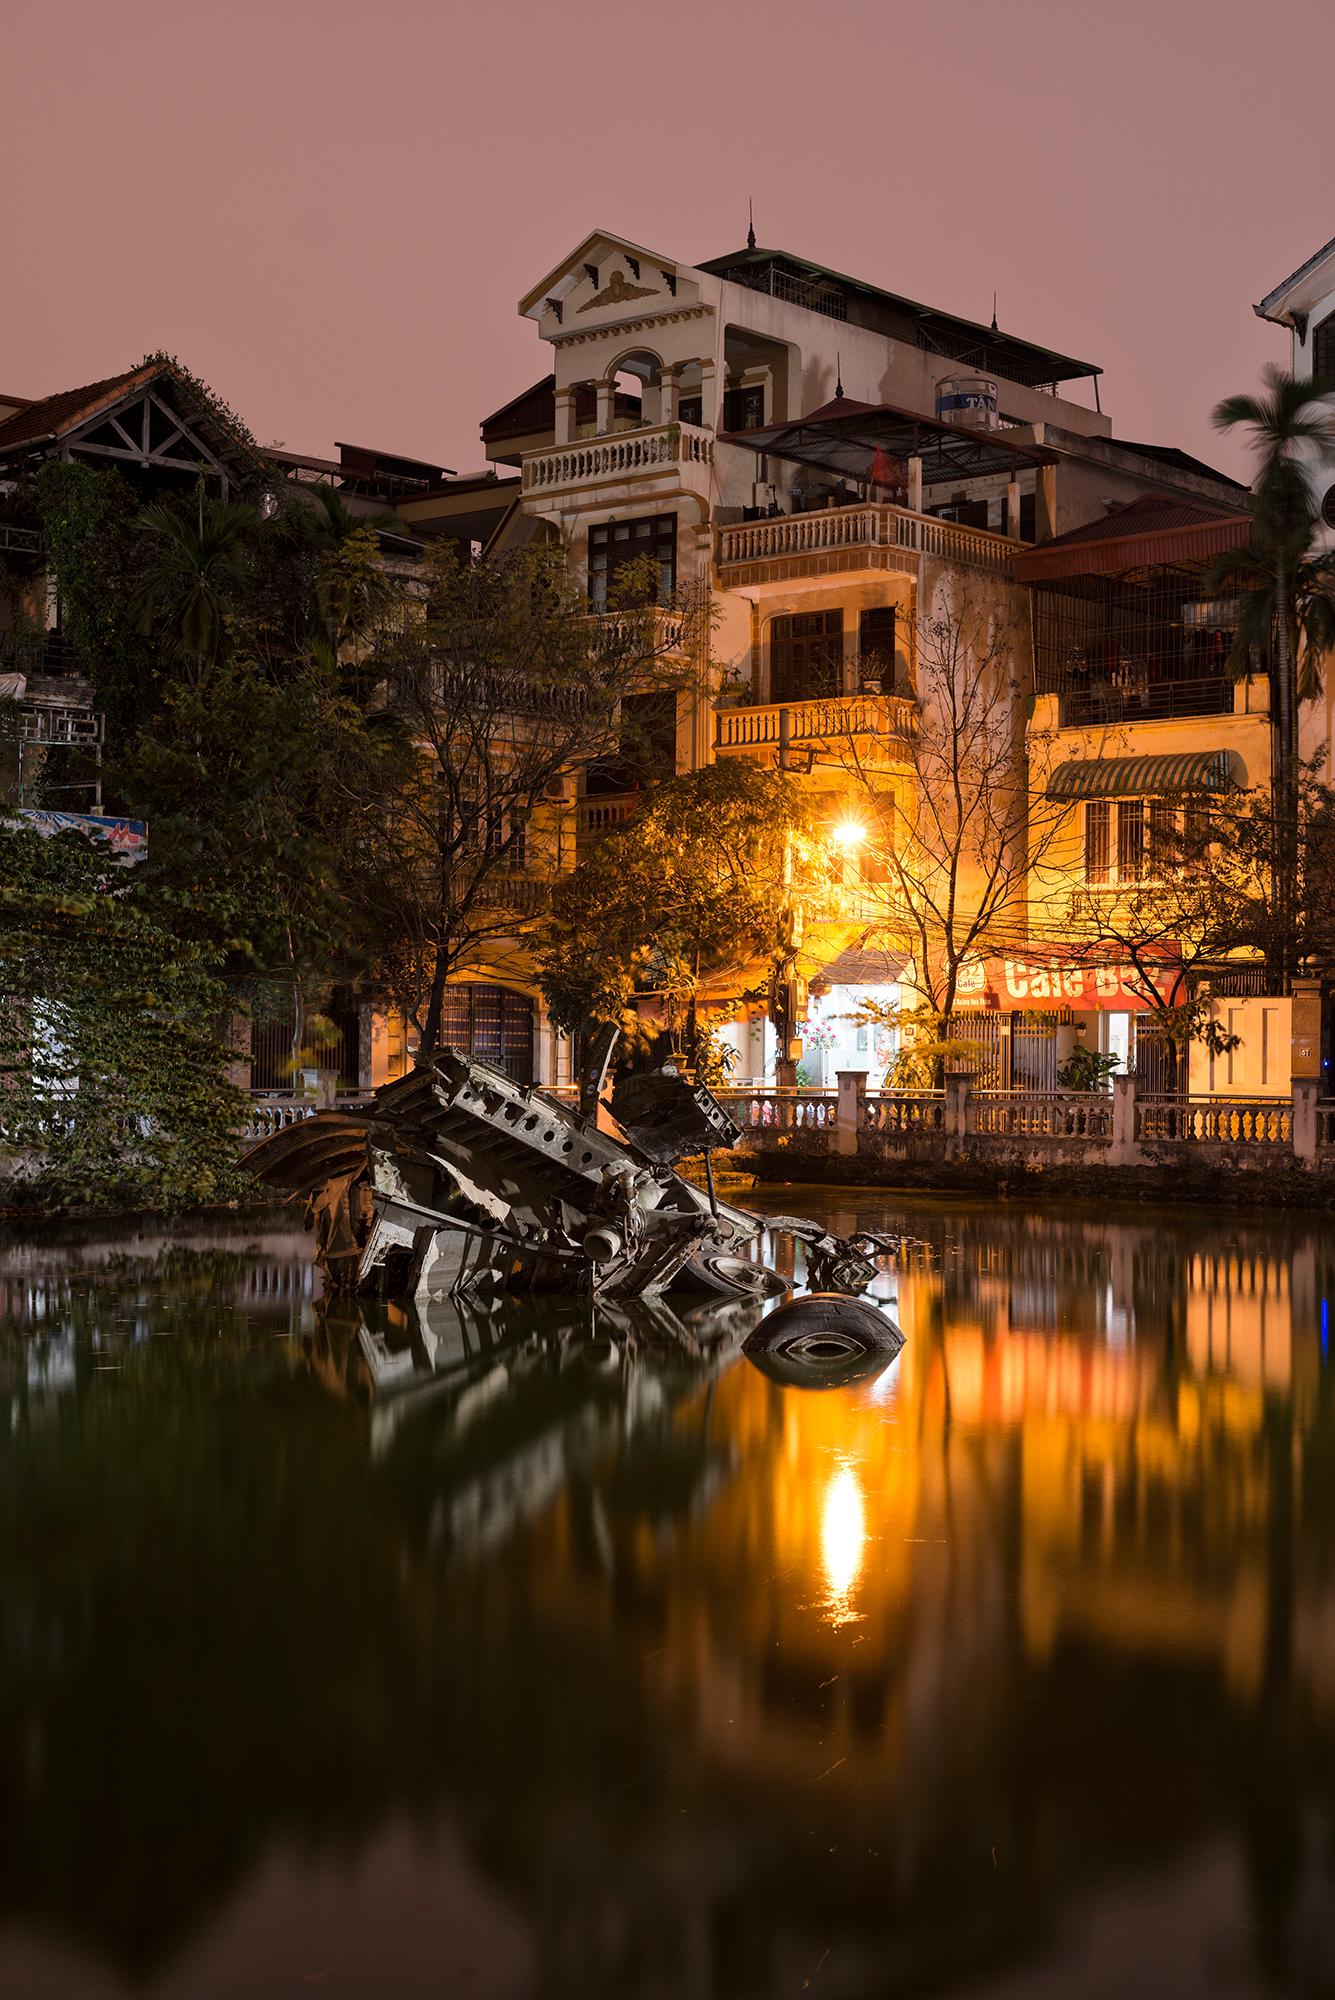 Skurrile Szenerie mitten in Hanoi: Überreste eines B-52 Bombers im Hu-Tiep-See.